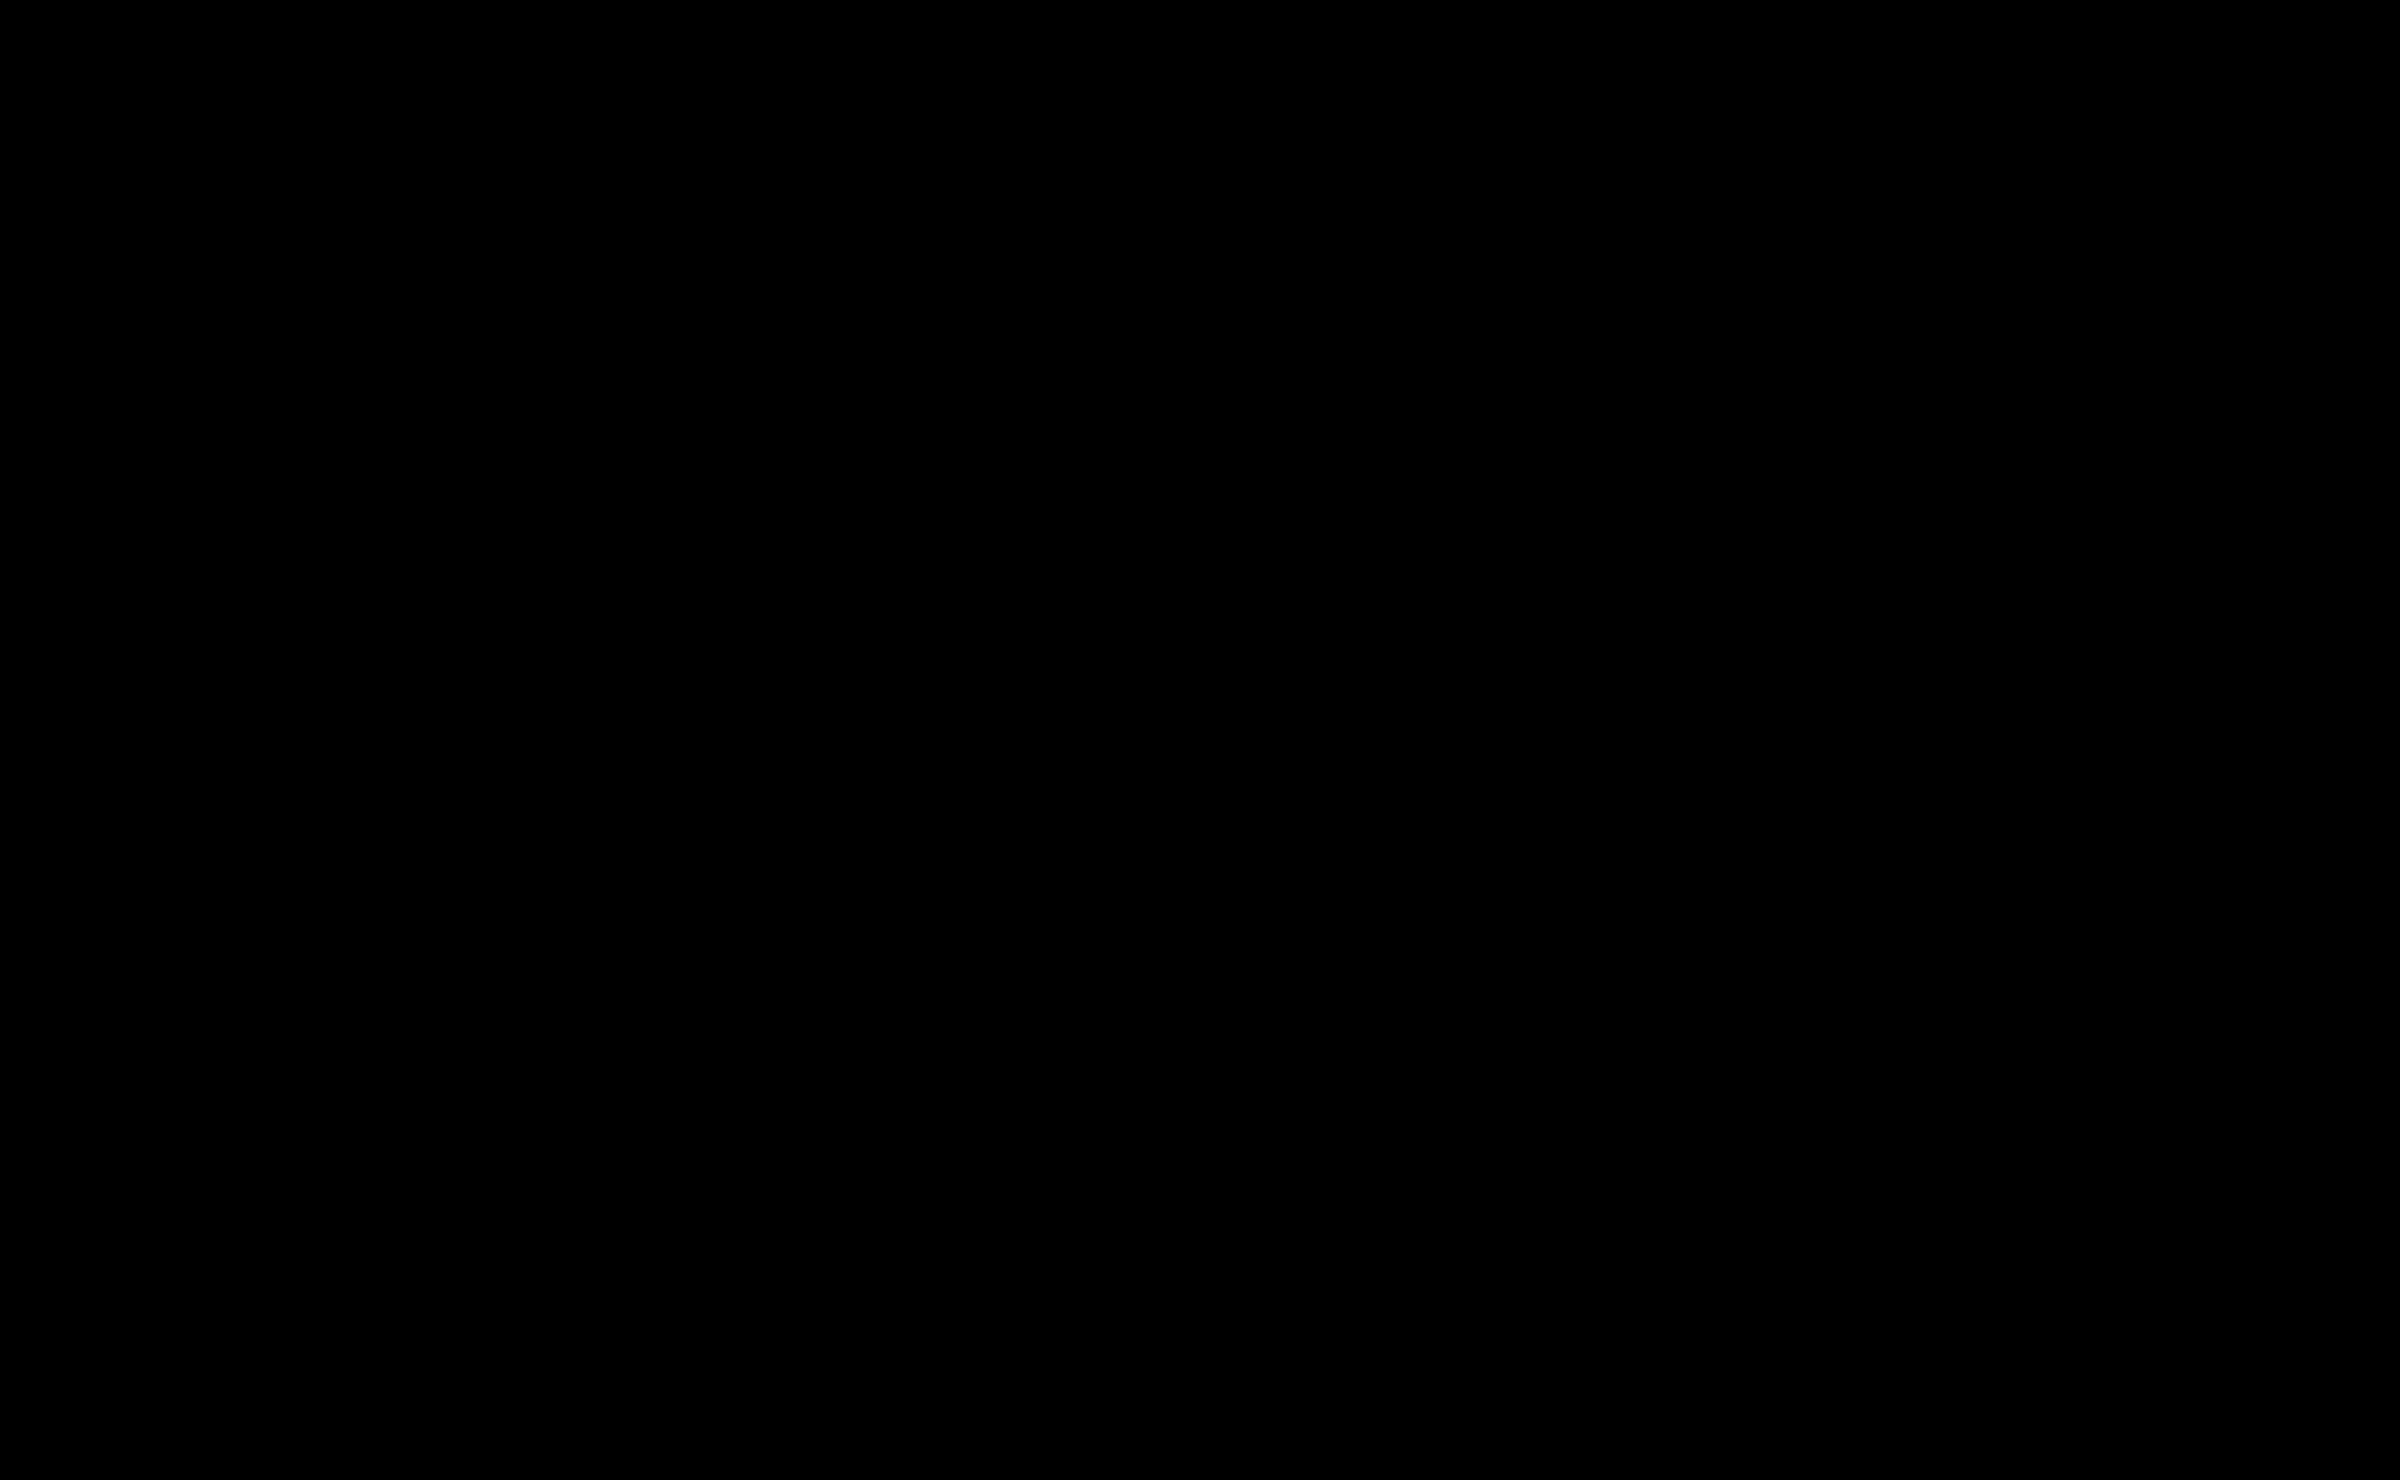 Army Gun Clipart Clip art of Gun Clipart #1579 — Clipartwork.